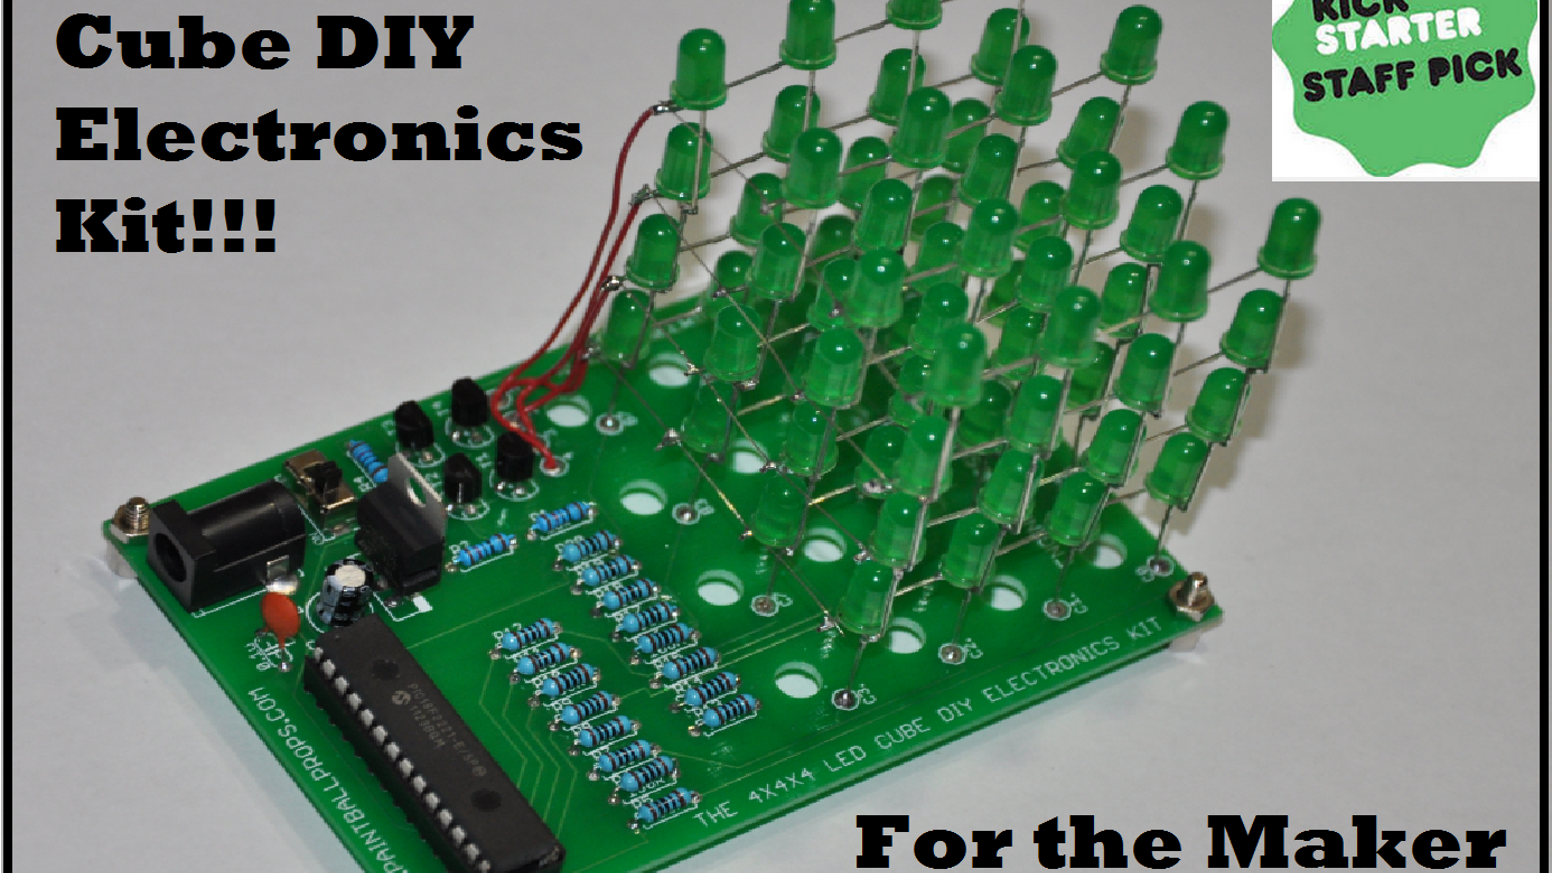 The 4x4x4 Led Cube Diy Electronics Kit Production Ready